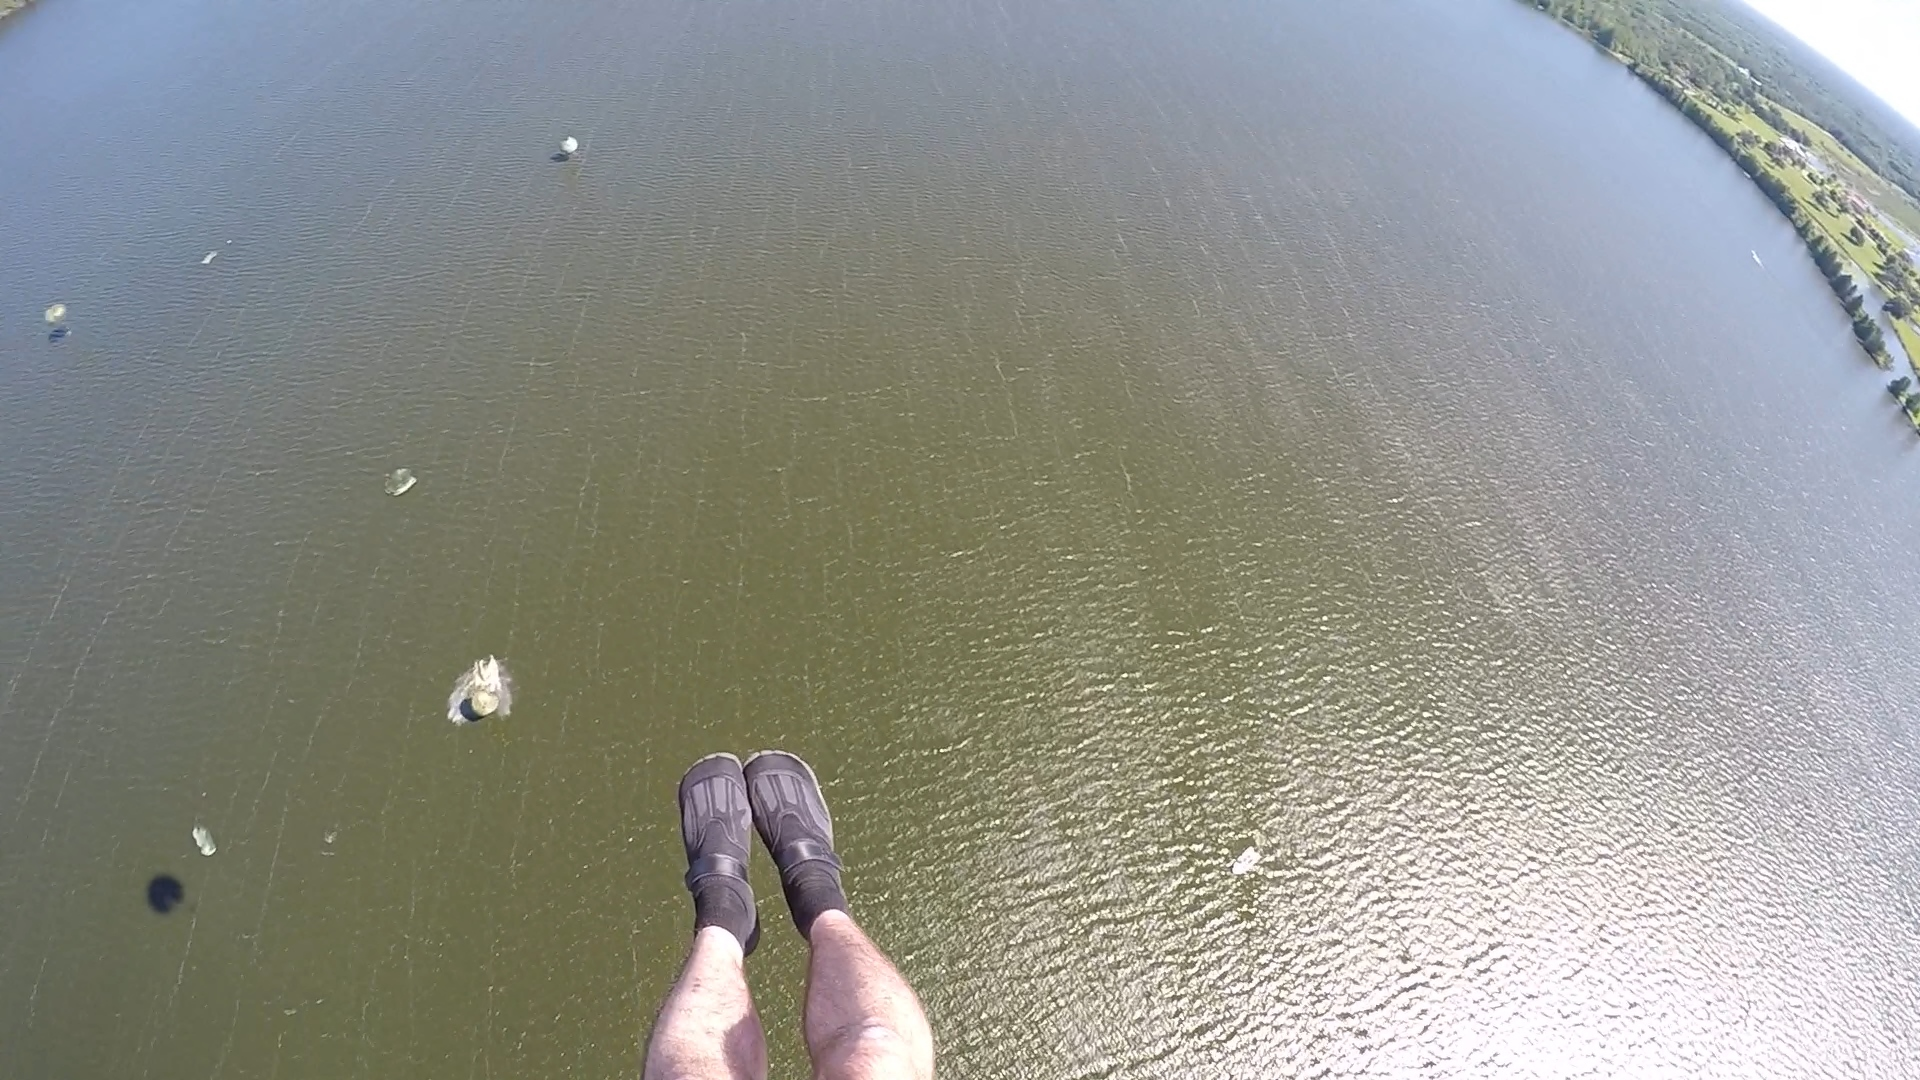 Airborne - 160409 - other chutes splash.jpg